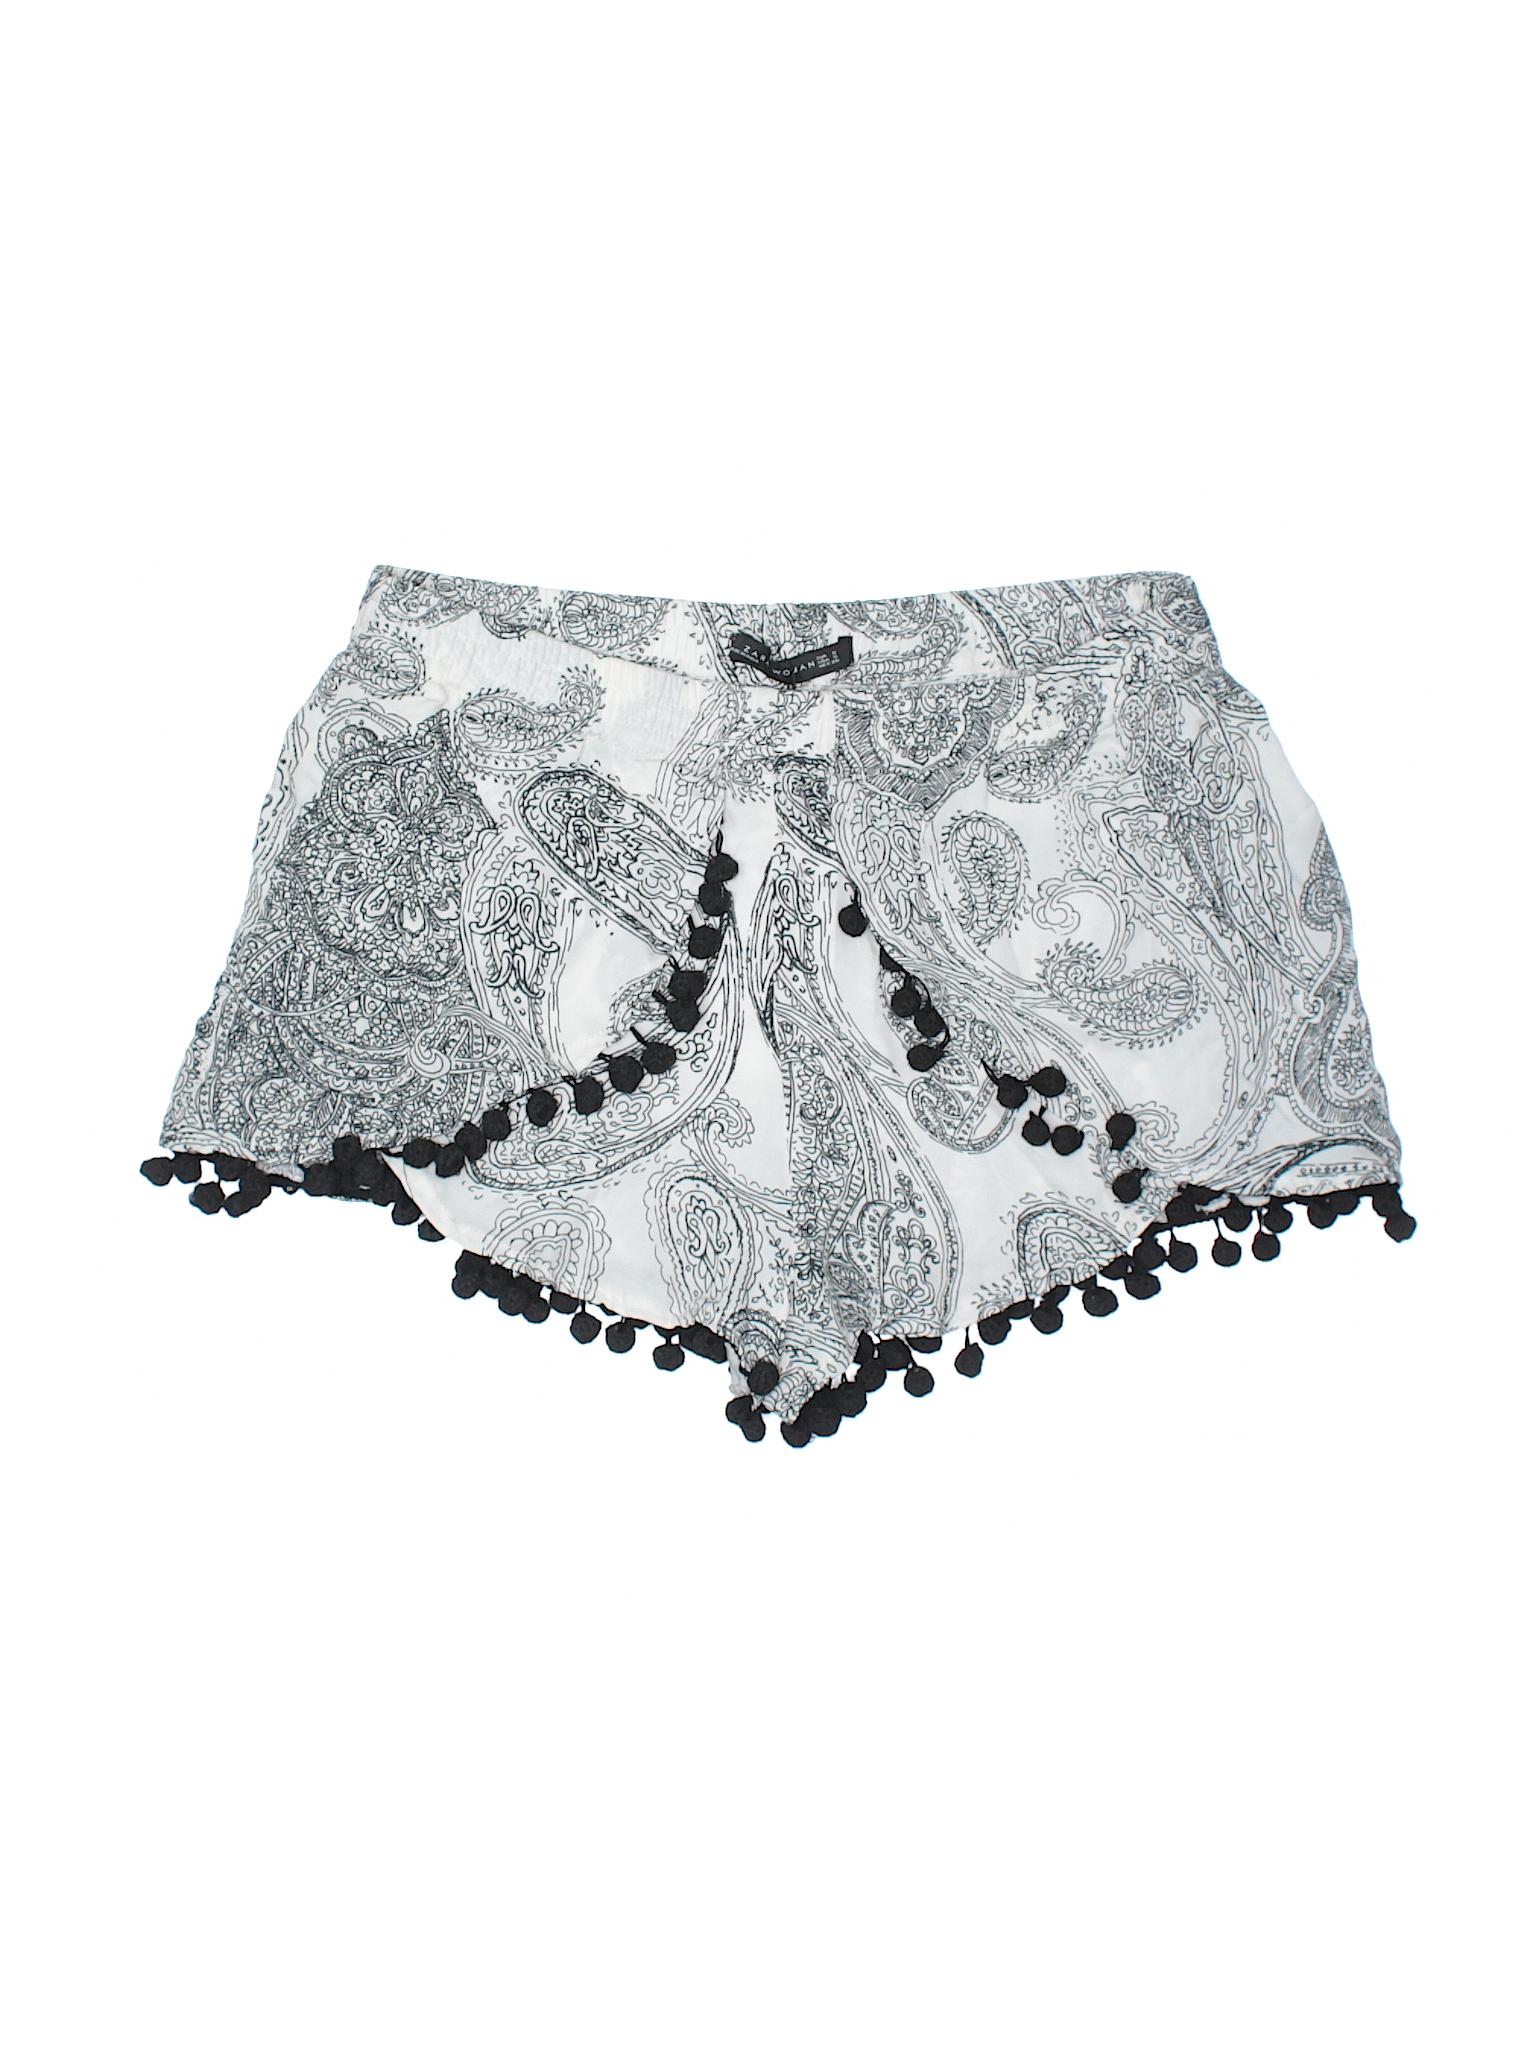 Boutique Shorts Boutique Boutique Boutique Zara Zara Shorts Shorts Zara Zara Shorts xH6F4x